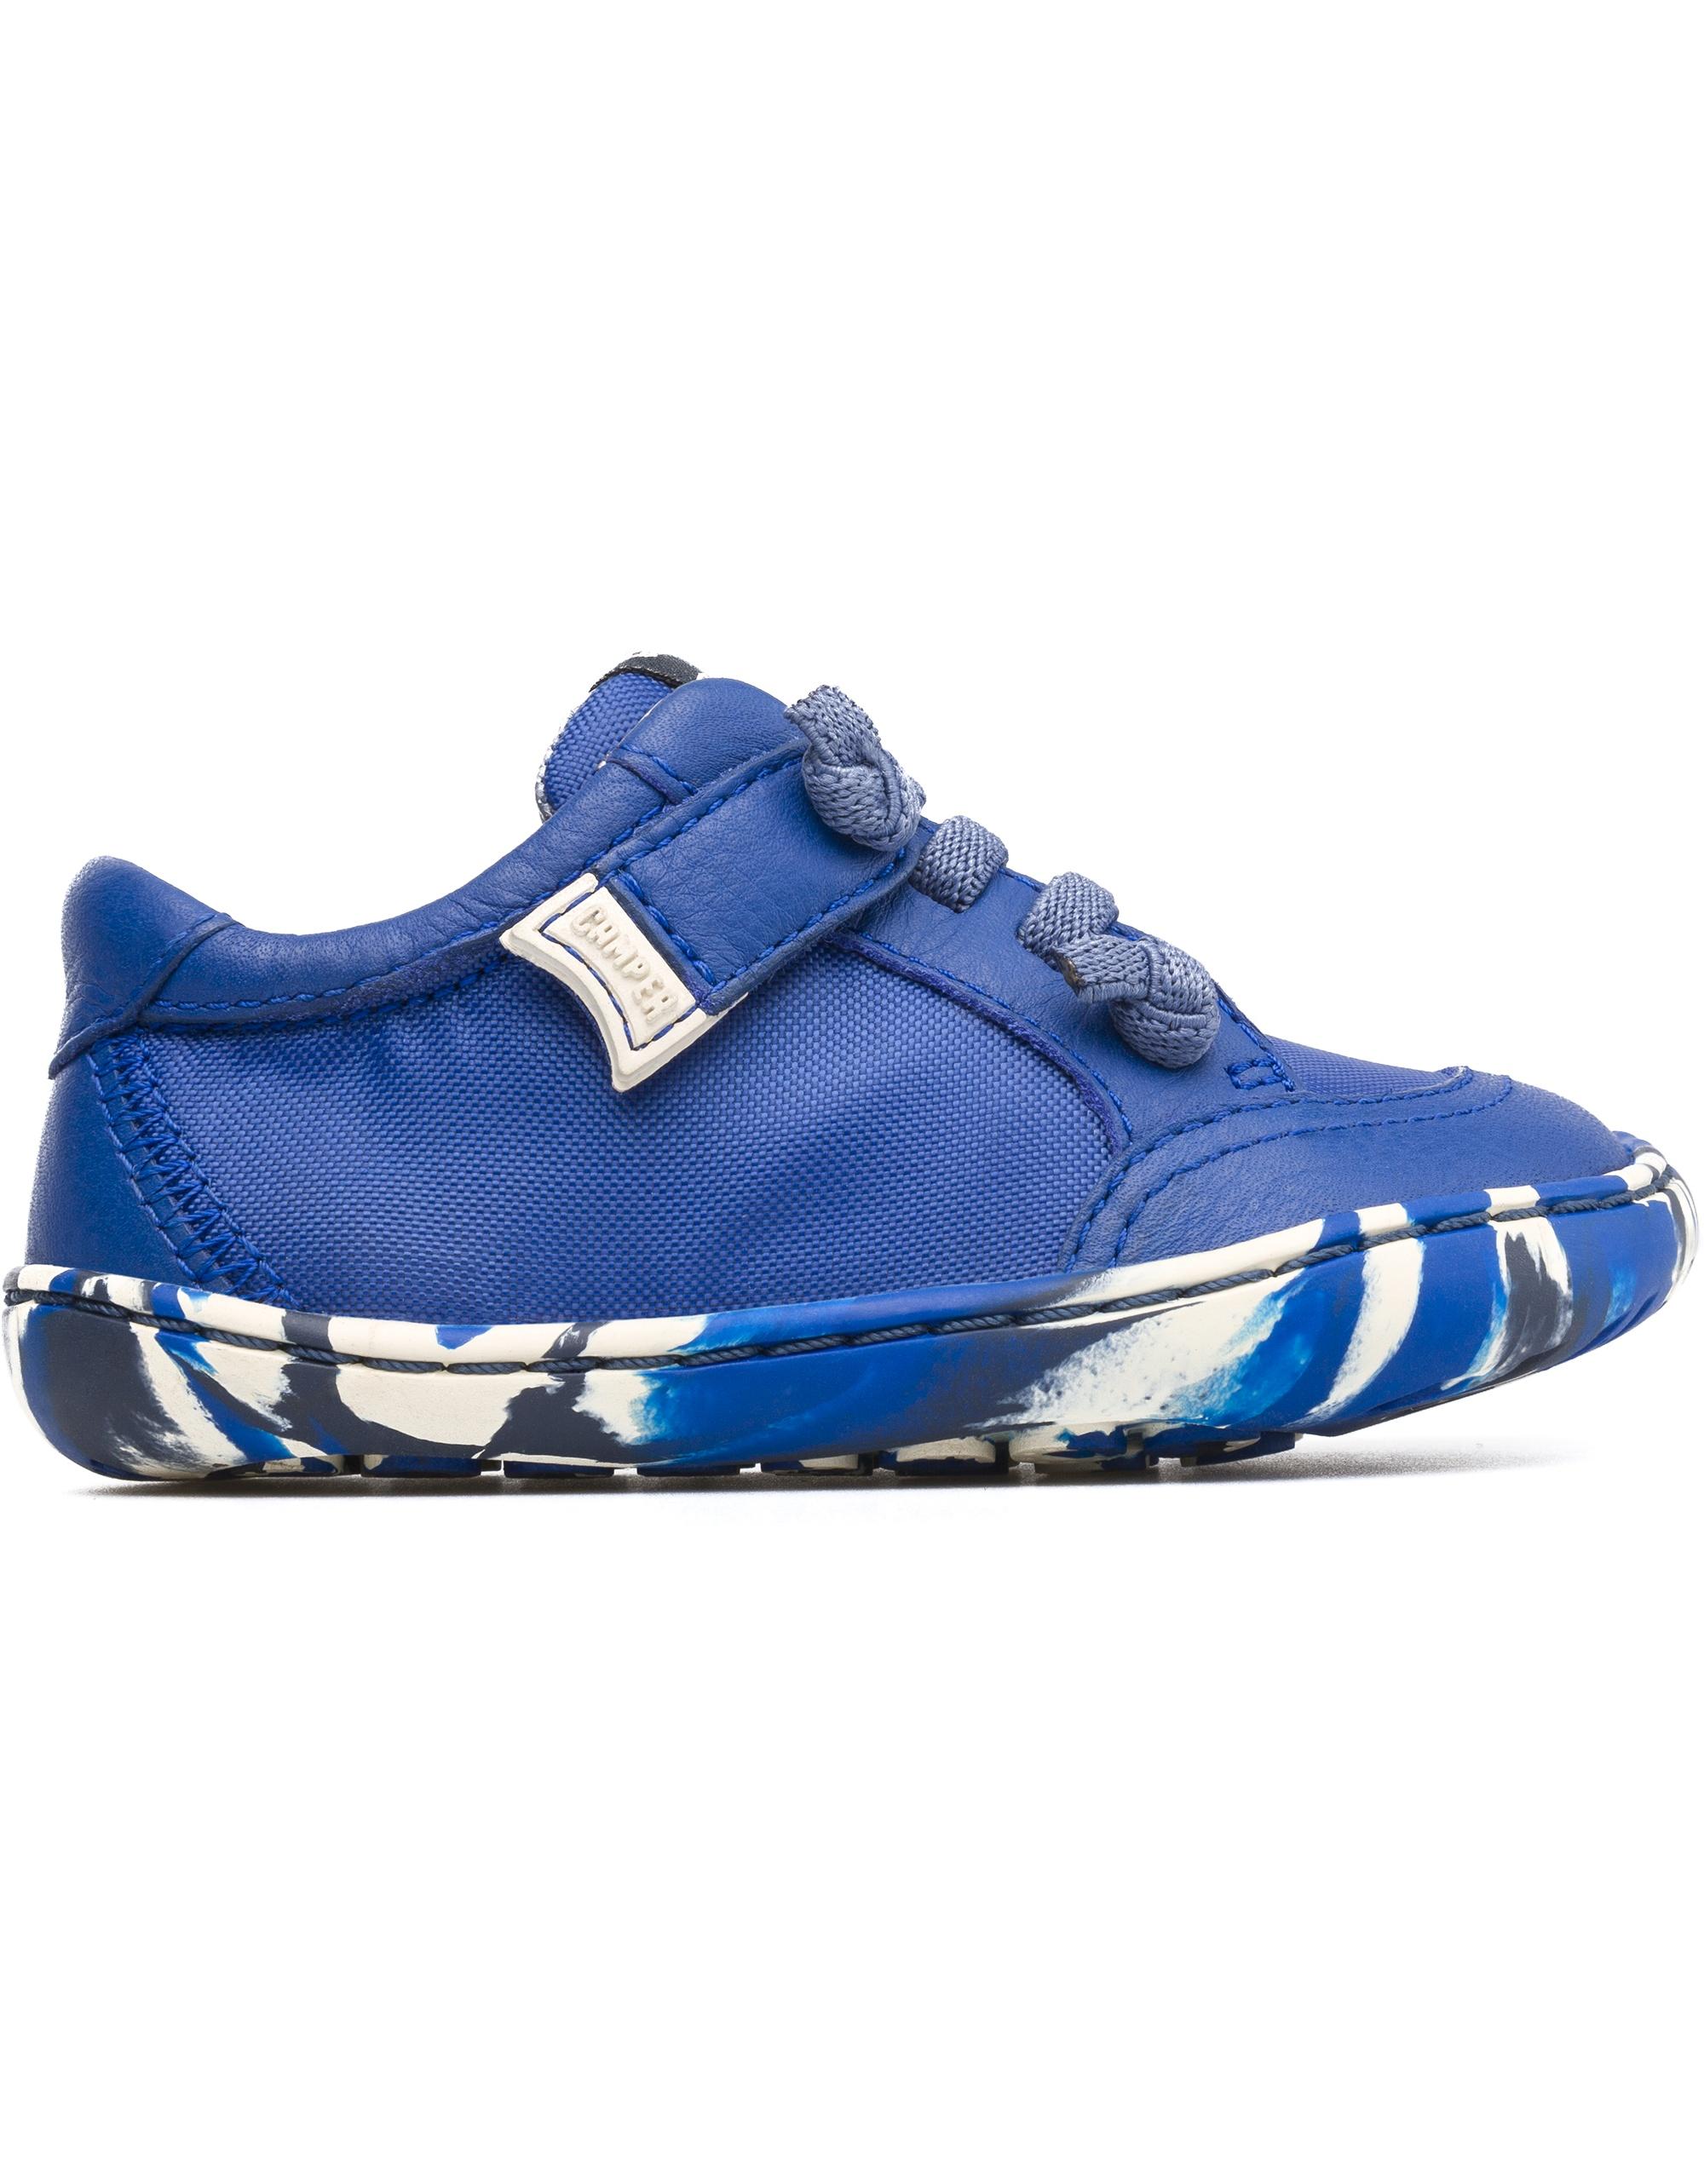 ccdc446a0f Camper Peu k800085-003 Casual Shoes Kids